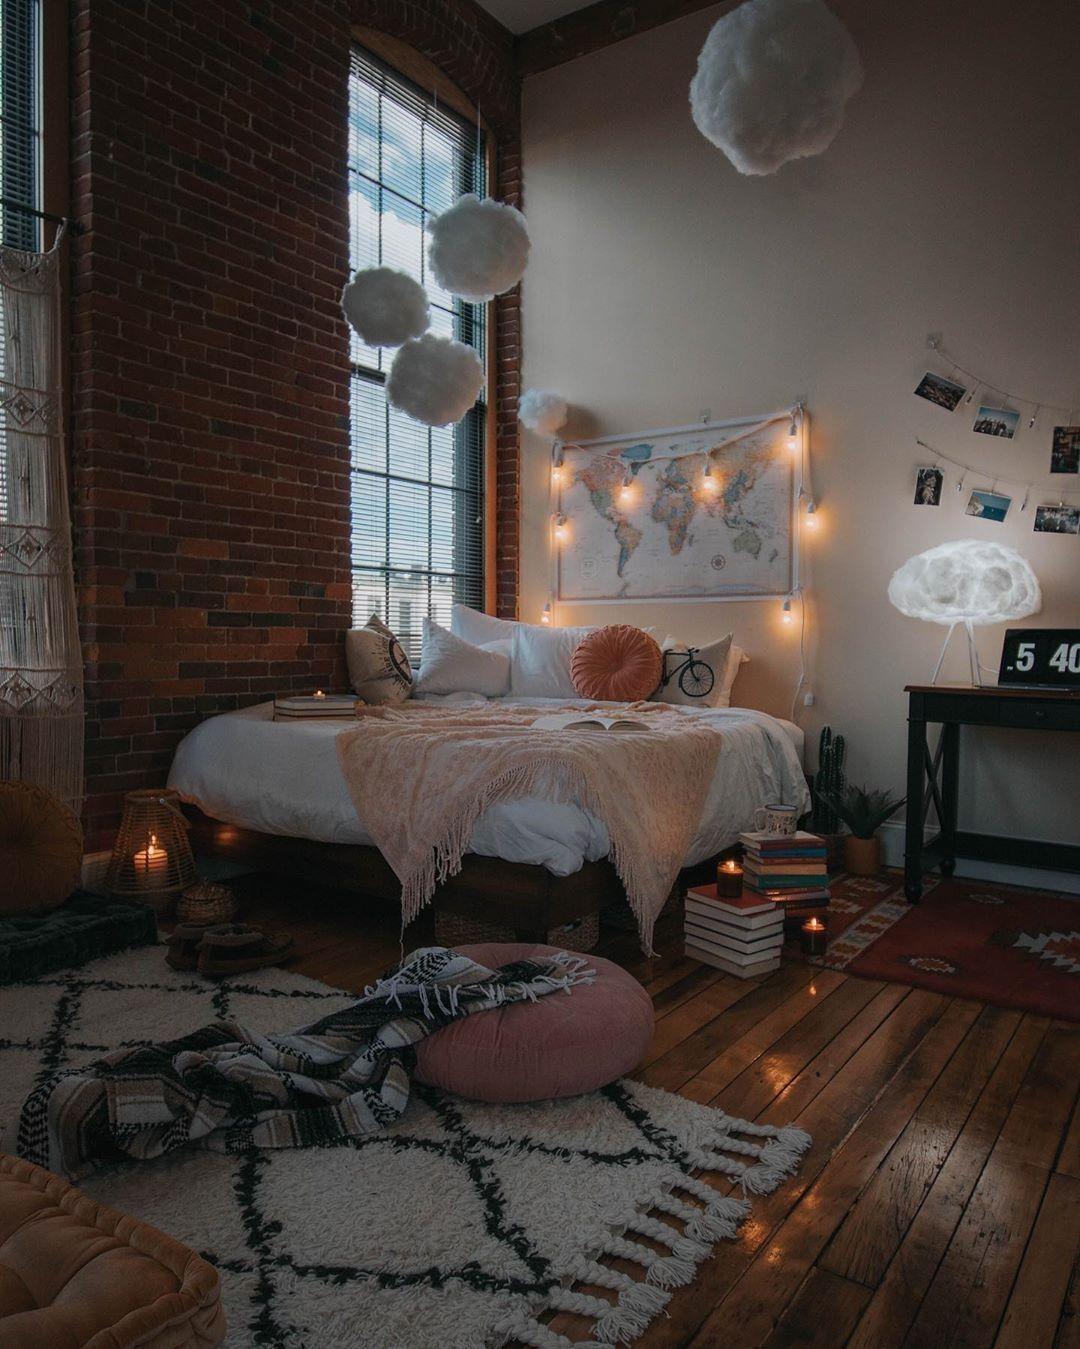 Bohemian Style Ideas For Beautiful Bedroom Decor Beautiful Bedroom Decor Bedroom Decor Aesthetic Room Decor